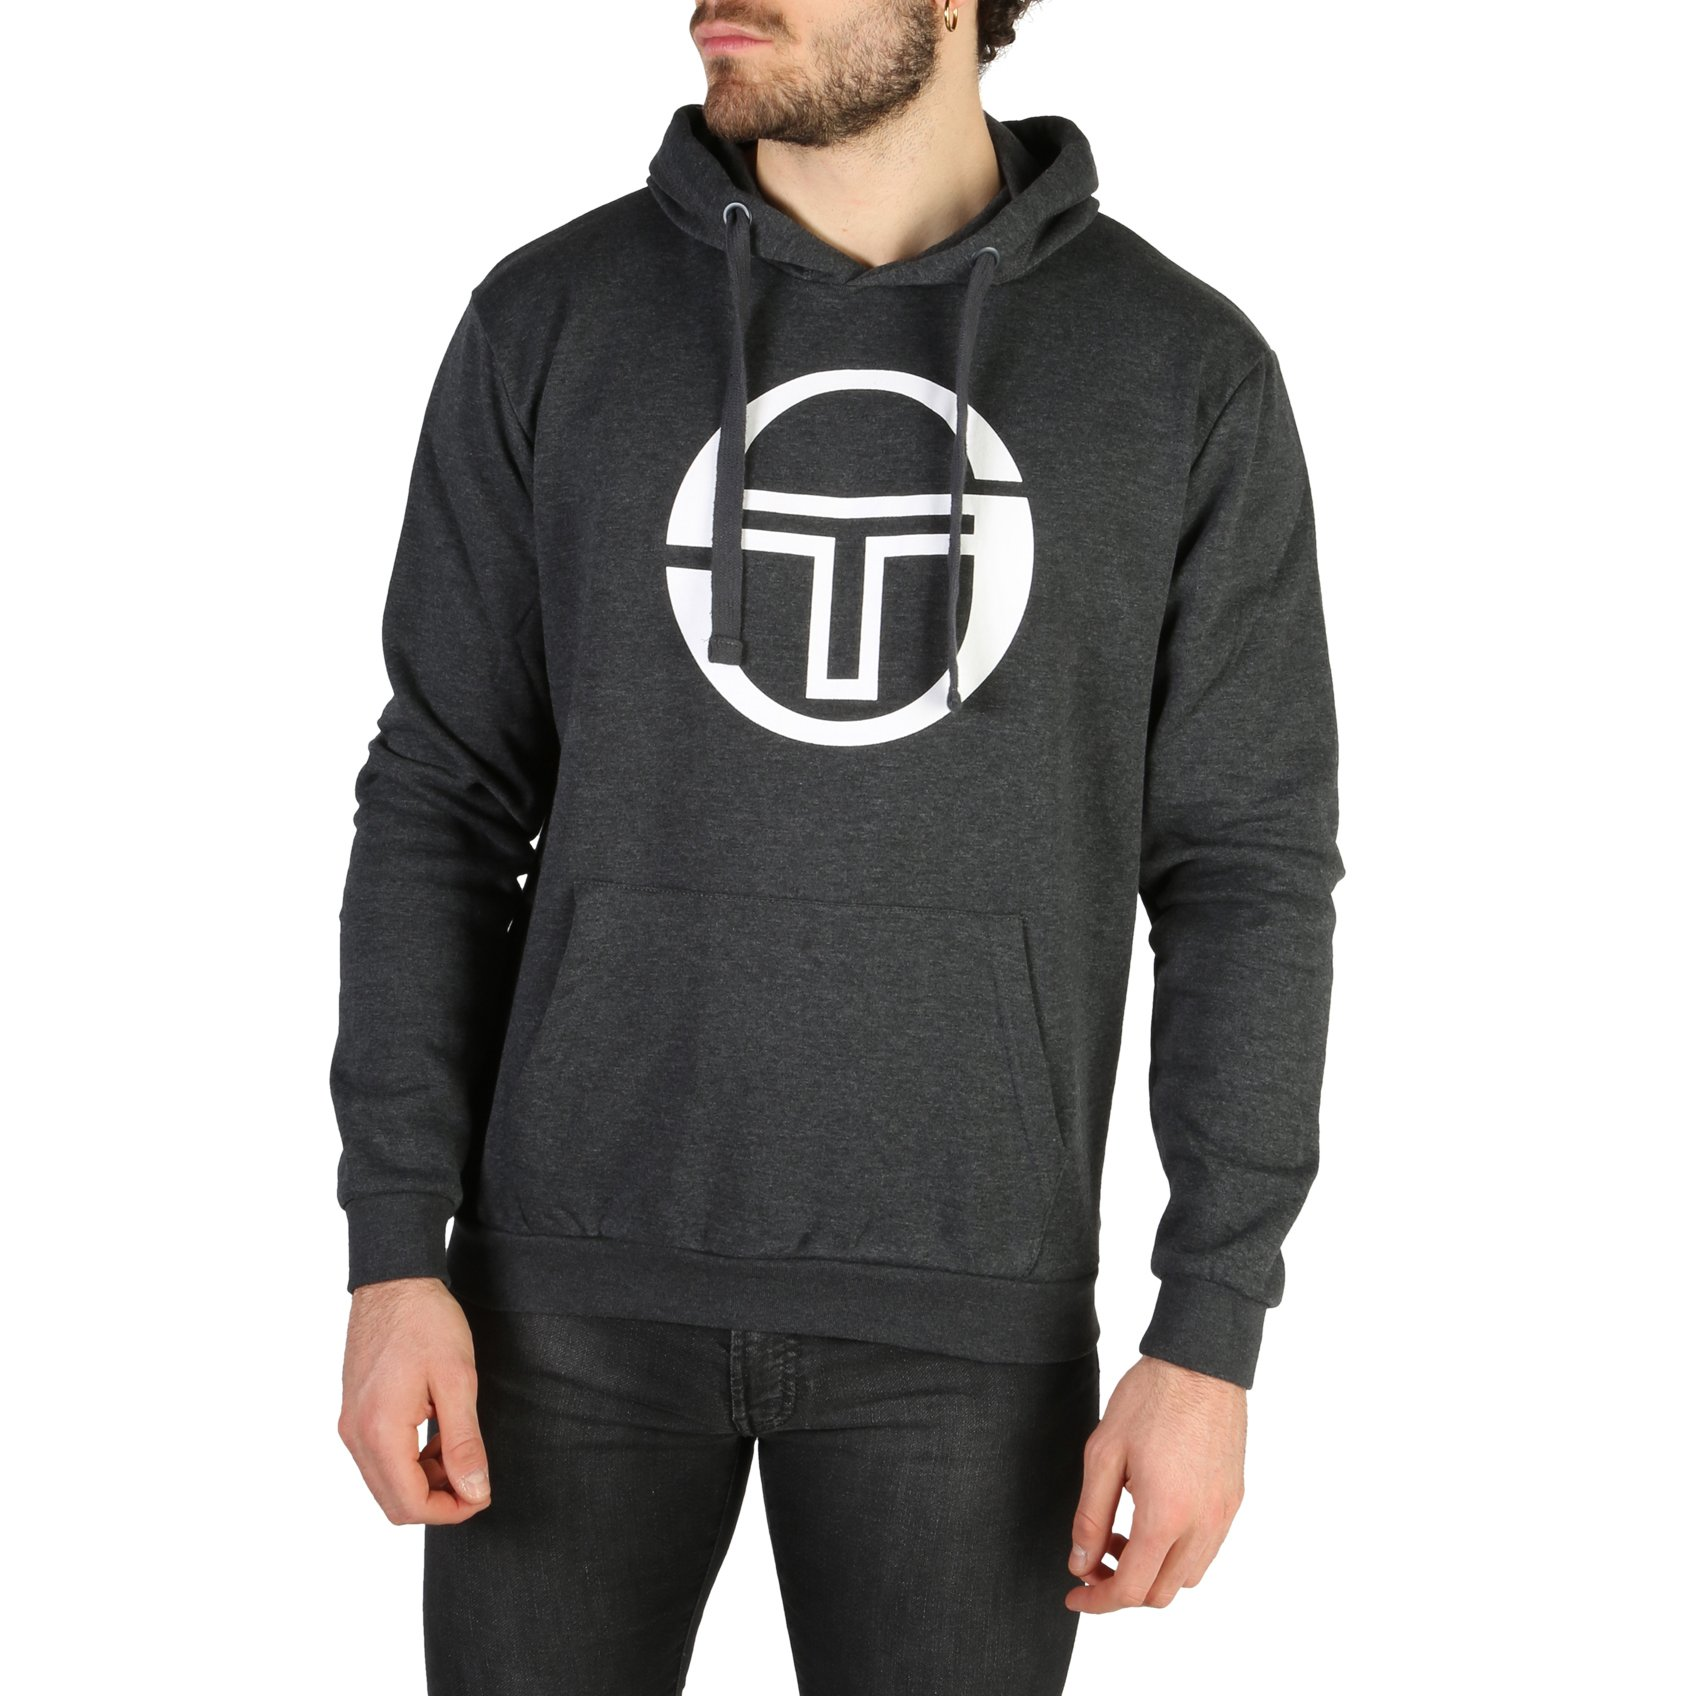 Sergio Tacchini Men's Sweatshirt Various Colours 103-10003 - grey-1 S